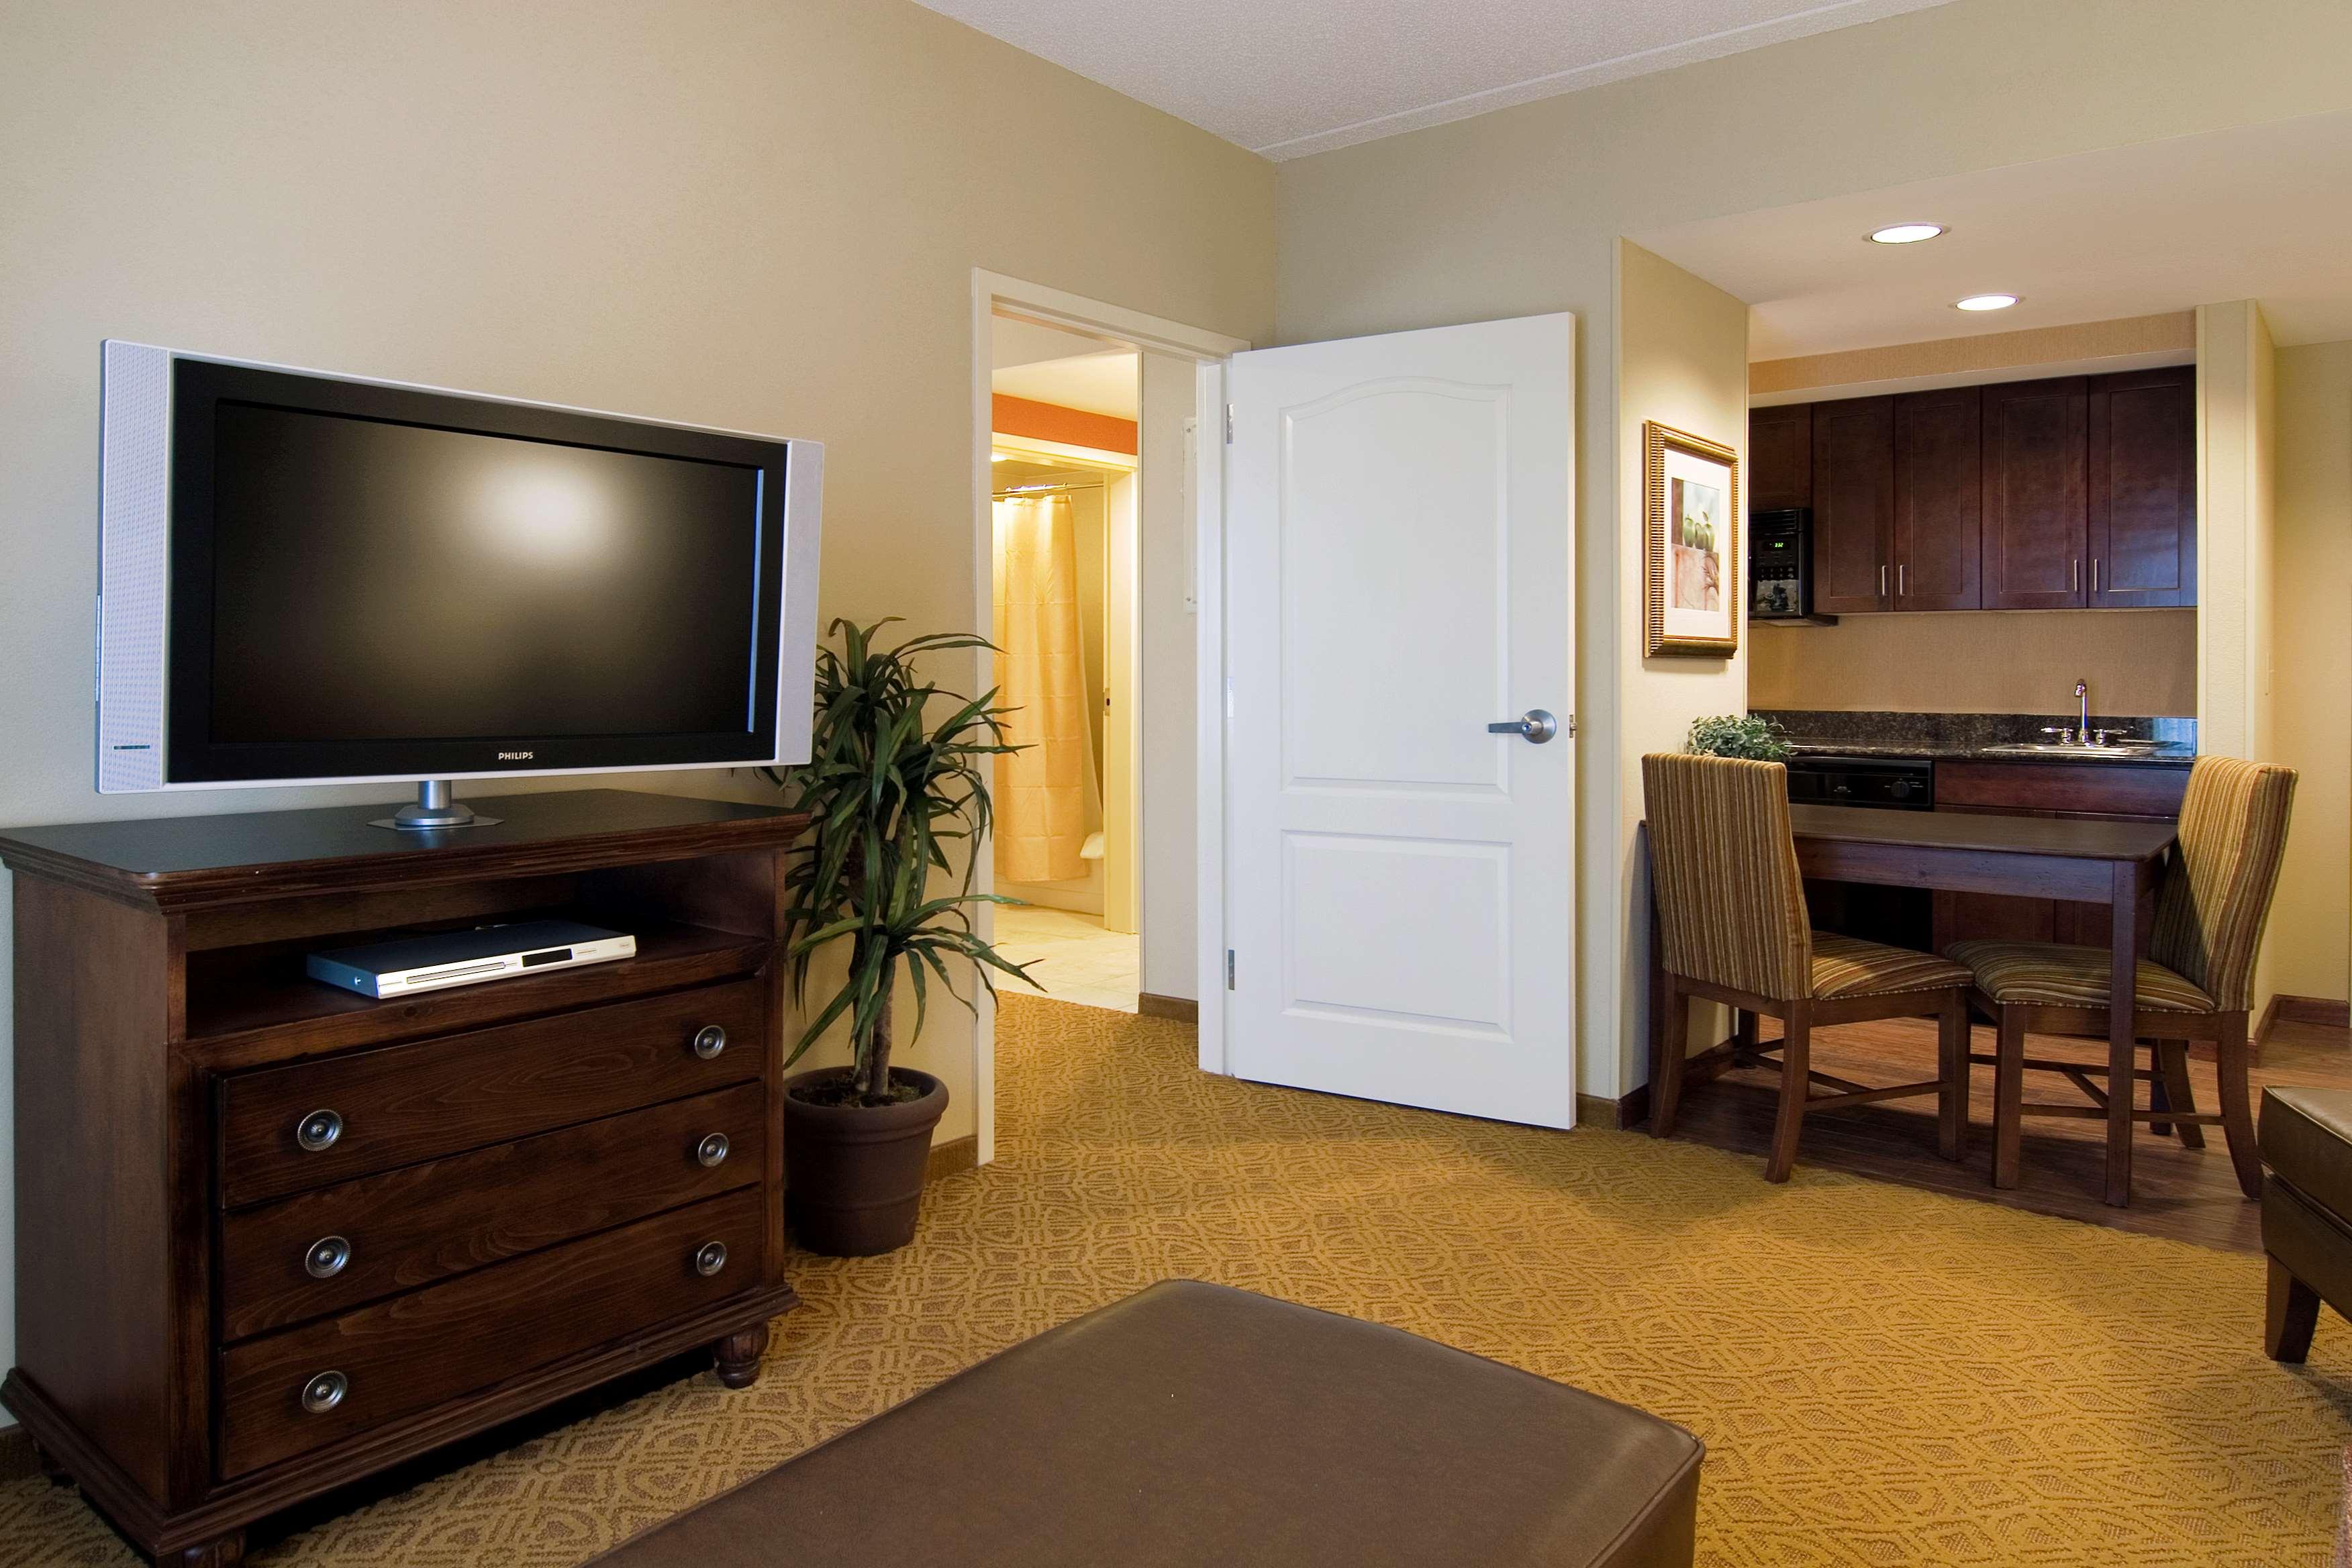 Homewood Suites by Hilton Fredericksburg image 18